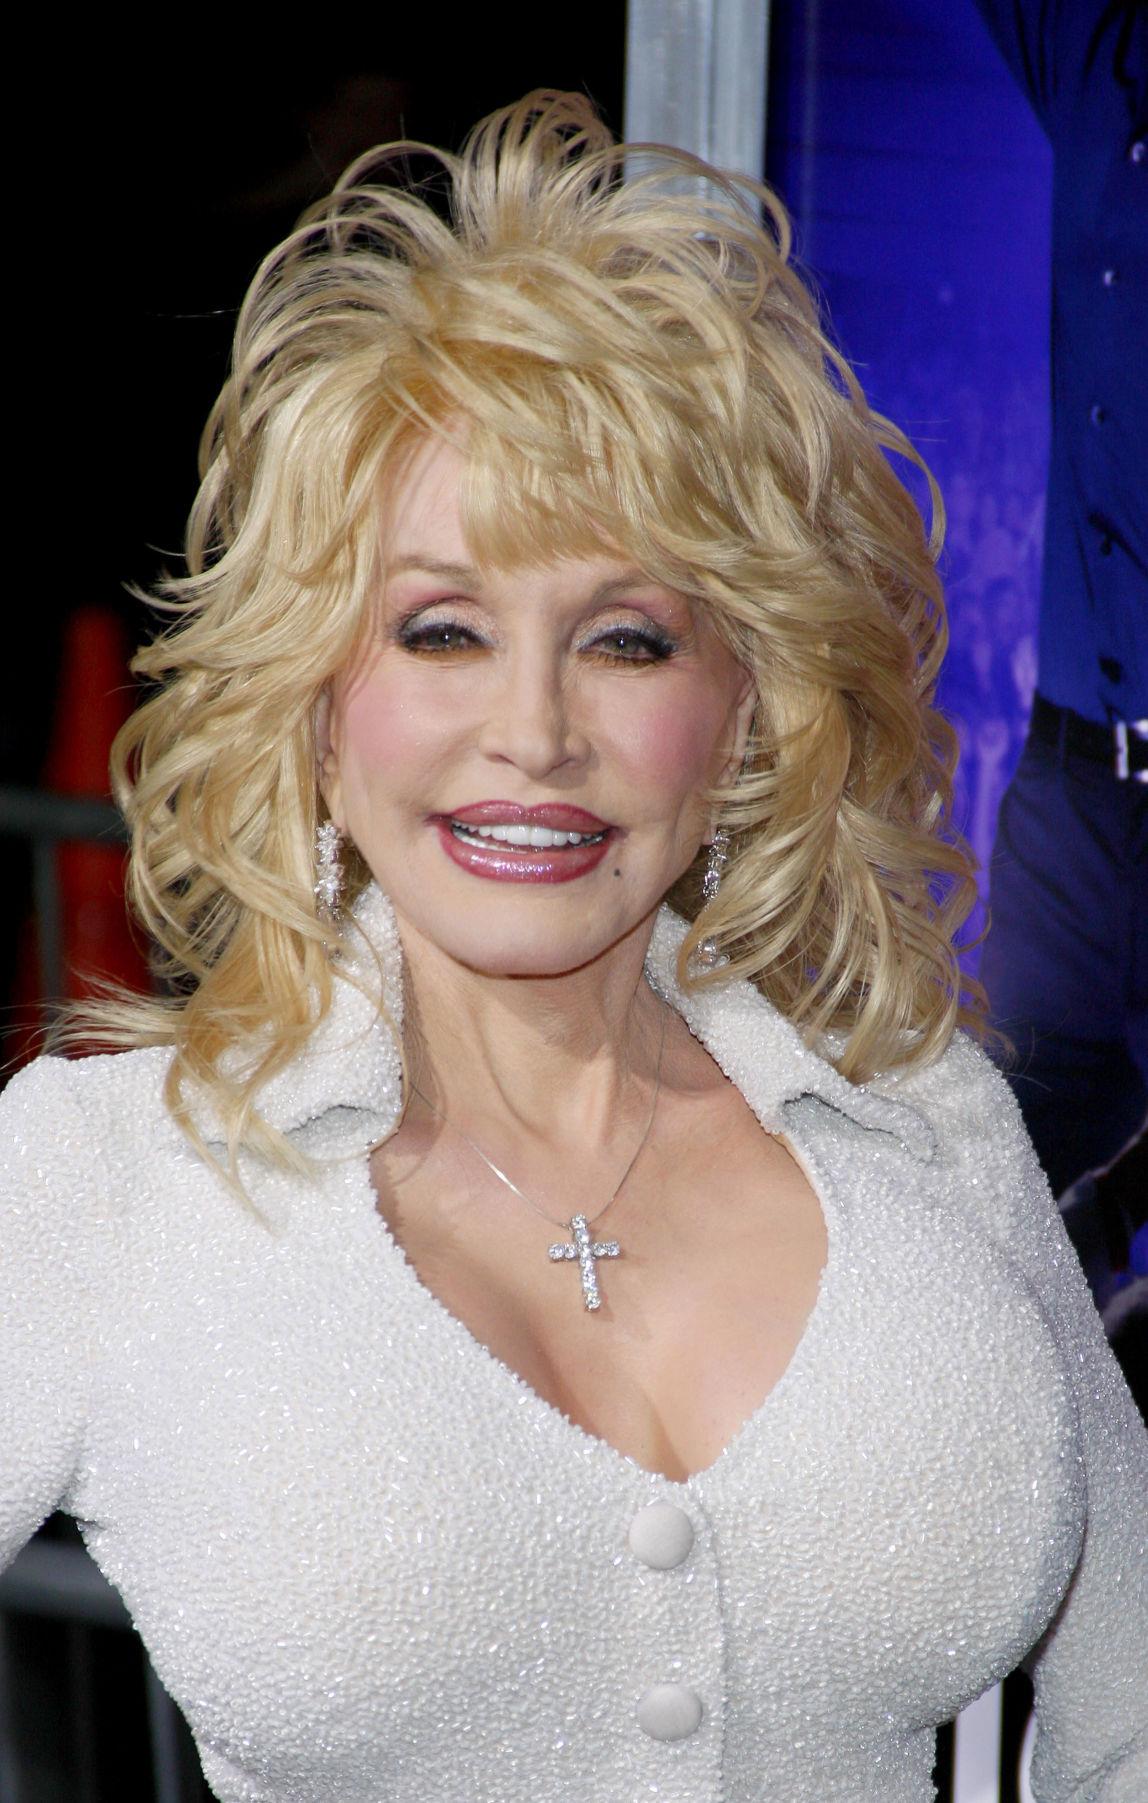 Dolly Parton reading children's stories online  Features  yoursun.com